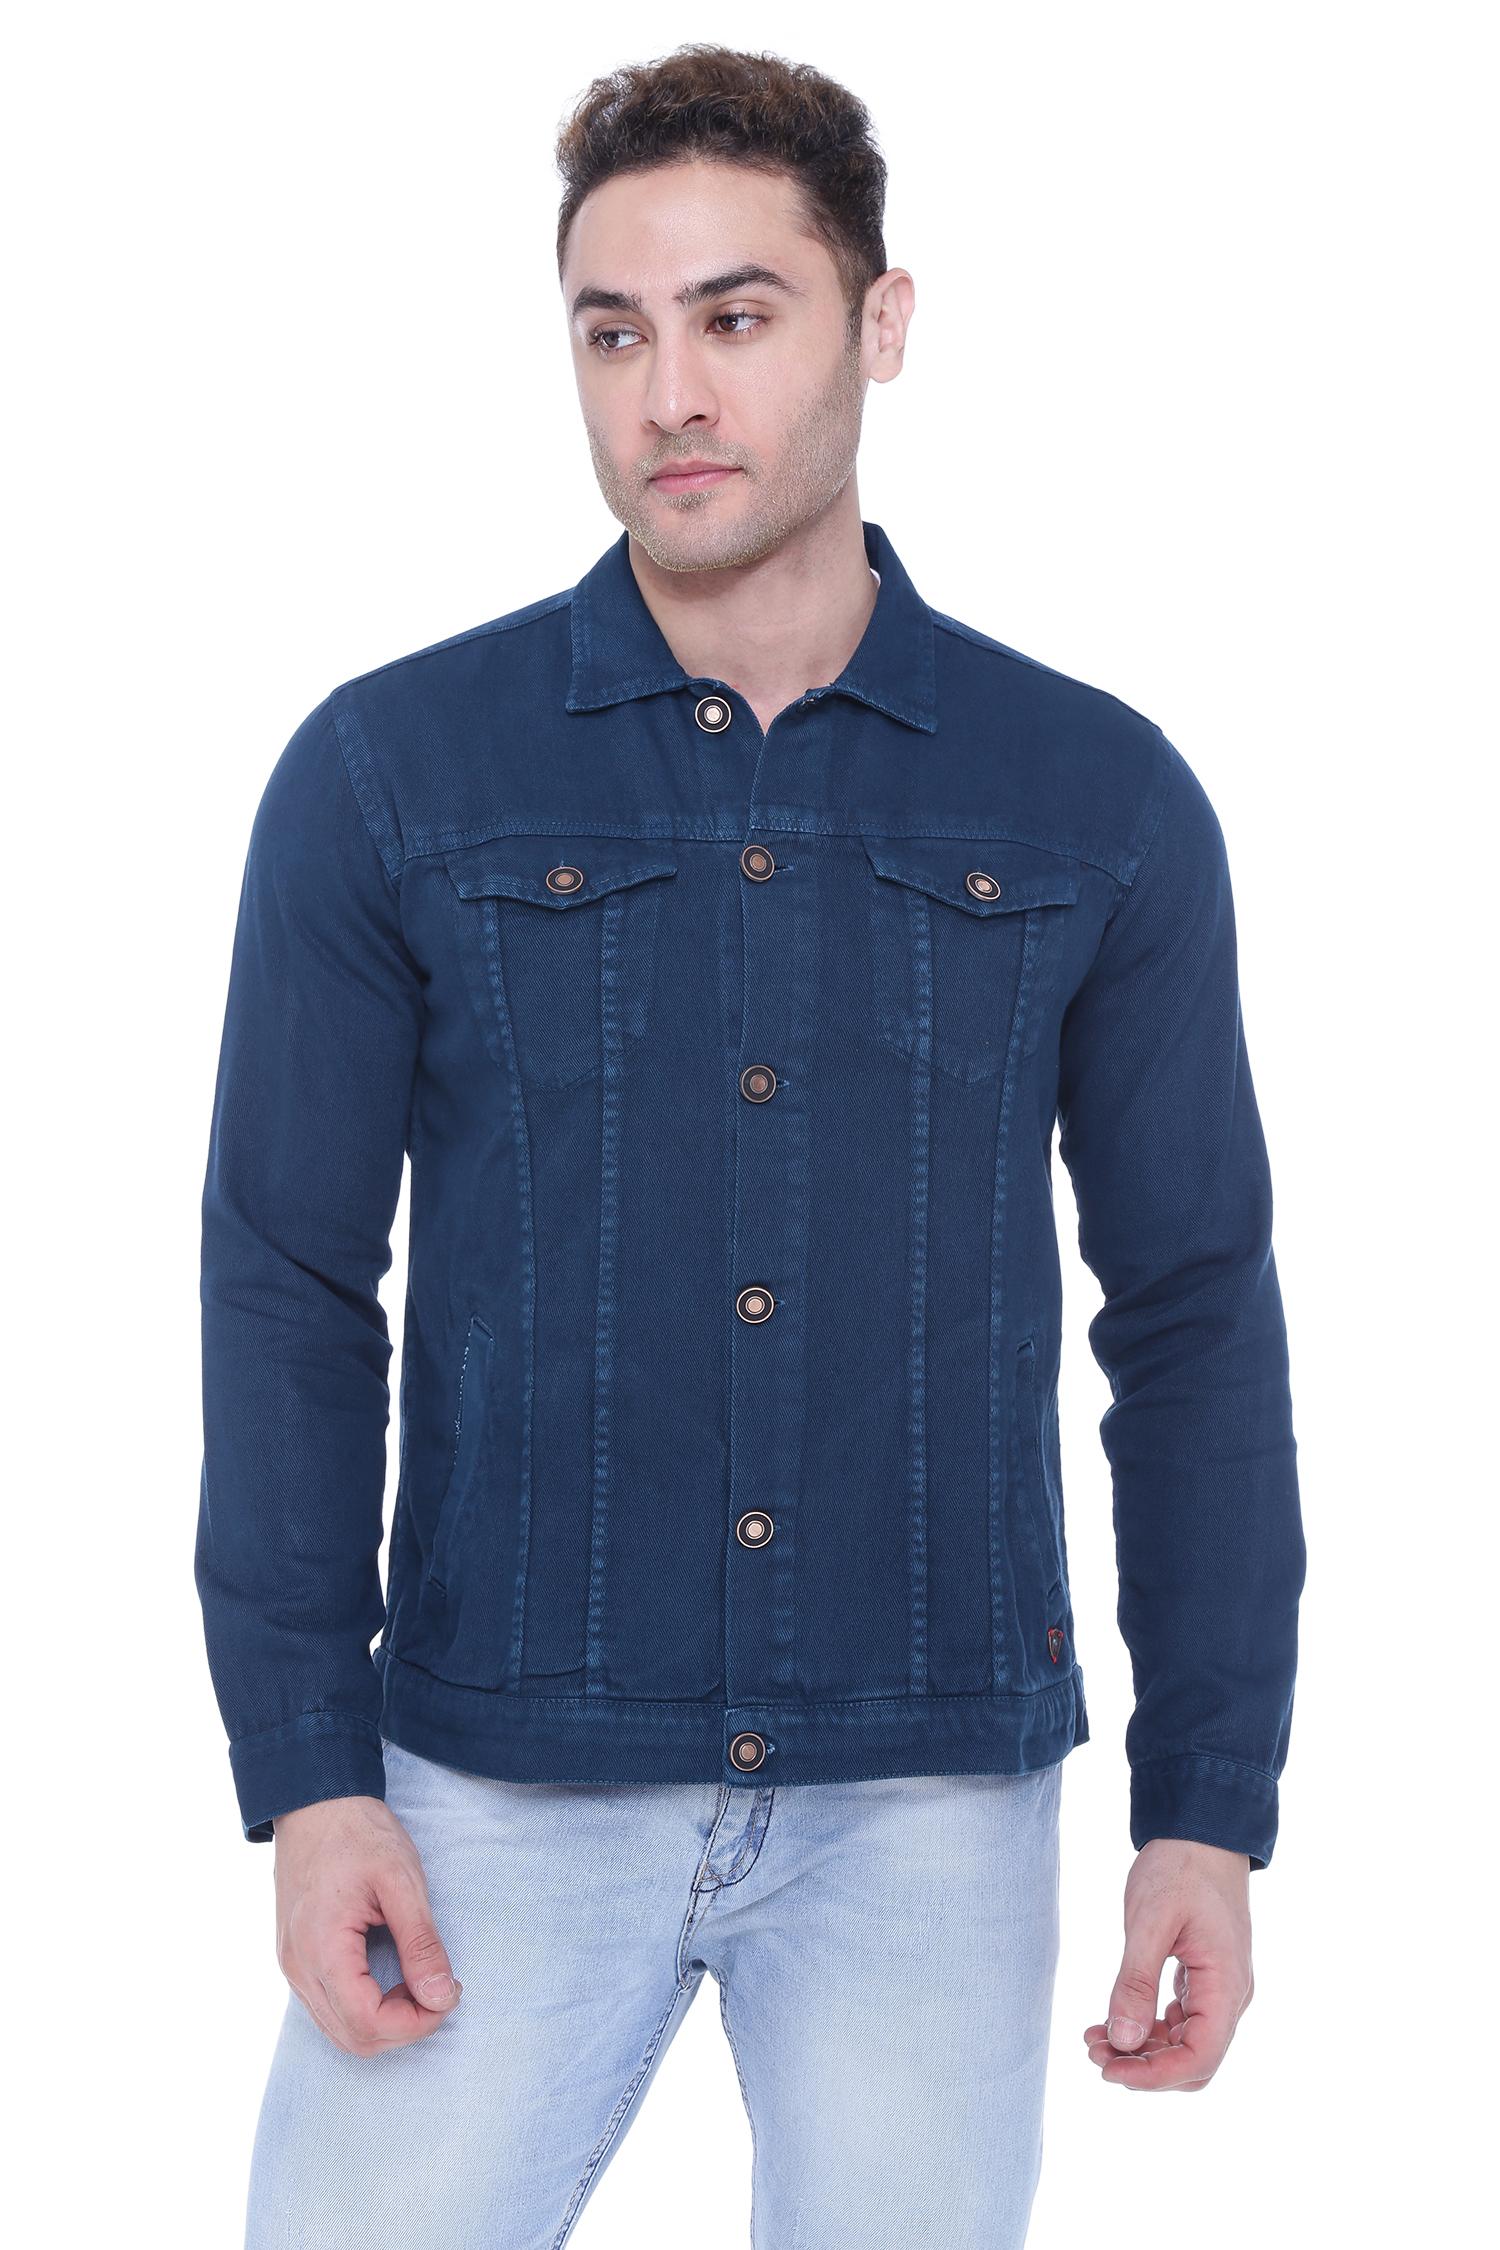 Kuons Avenue | Kuons Avenue Men's Teal Blue Denim Jacket- KACLFS1365TB